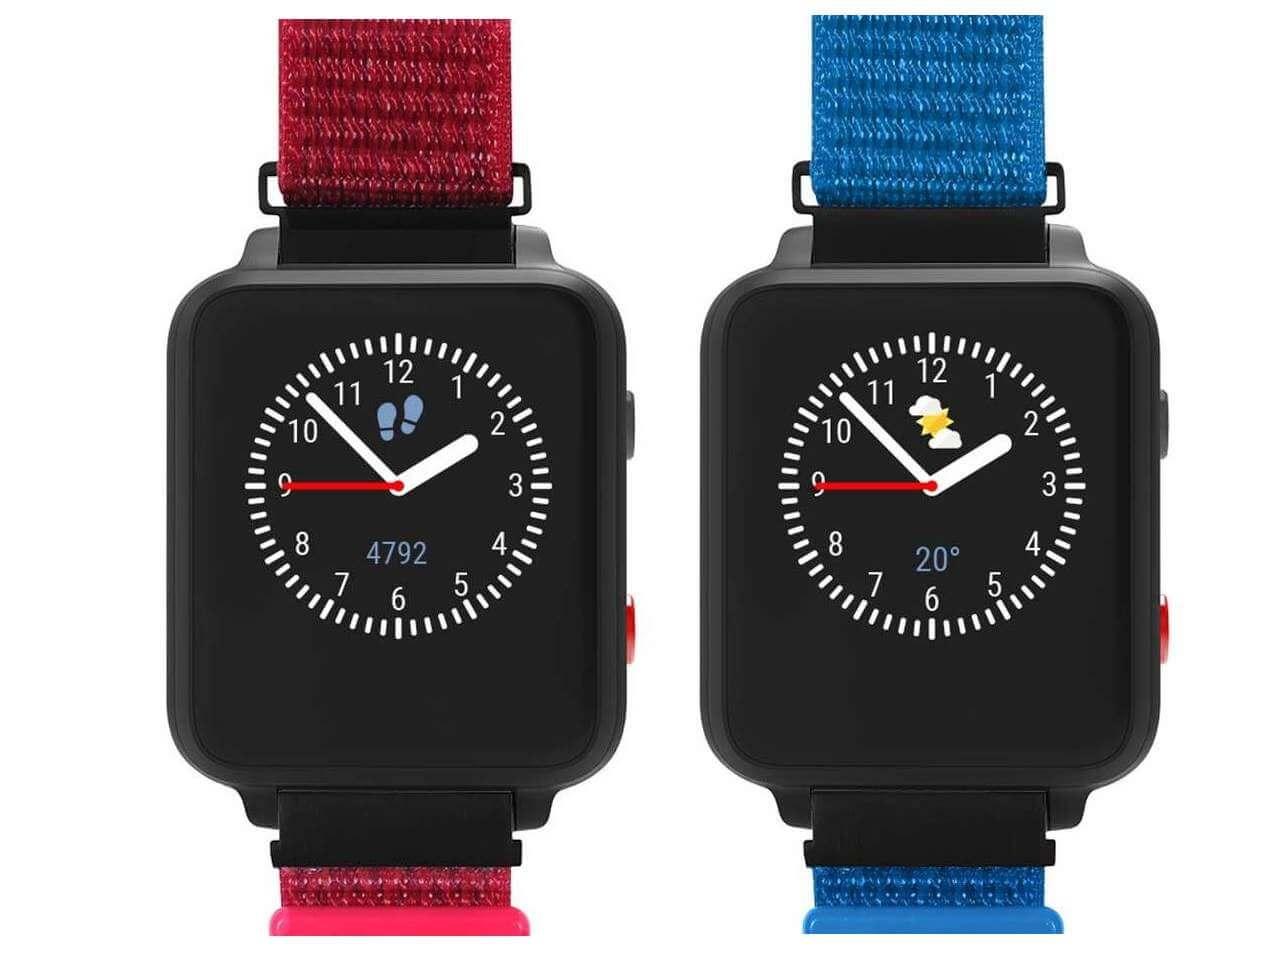 anio 5 kinder smartwatch_1